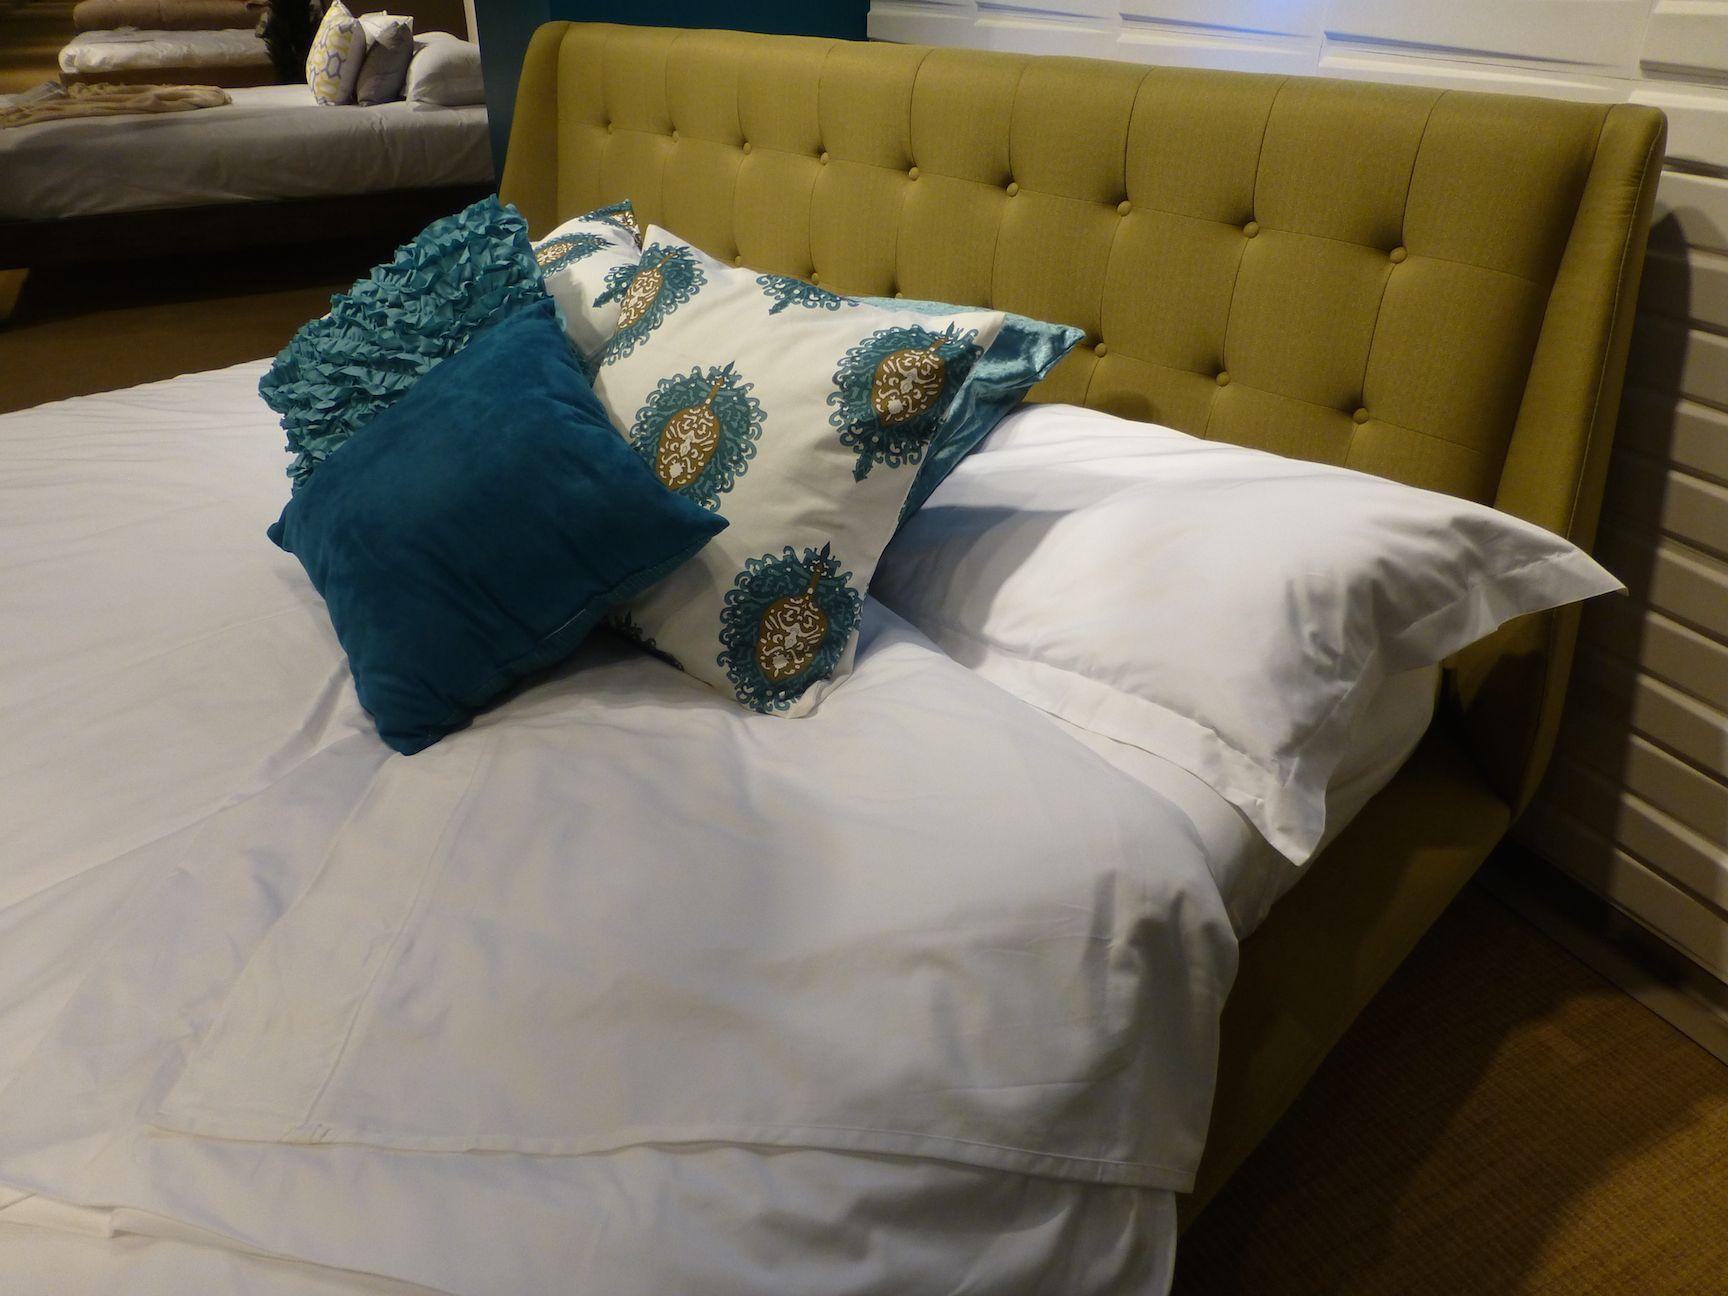 Leggett & Platt Consumer Products Group upholstered platform bed pays tribute to mid-20th century modern design